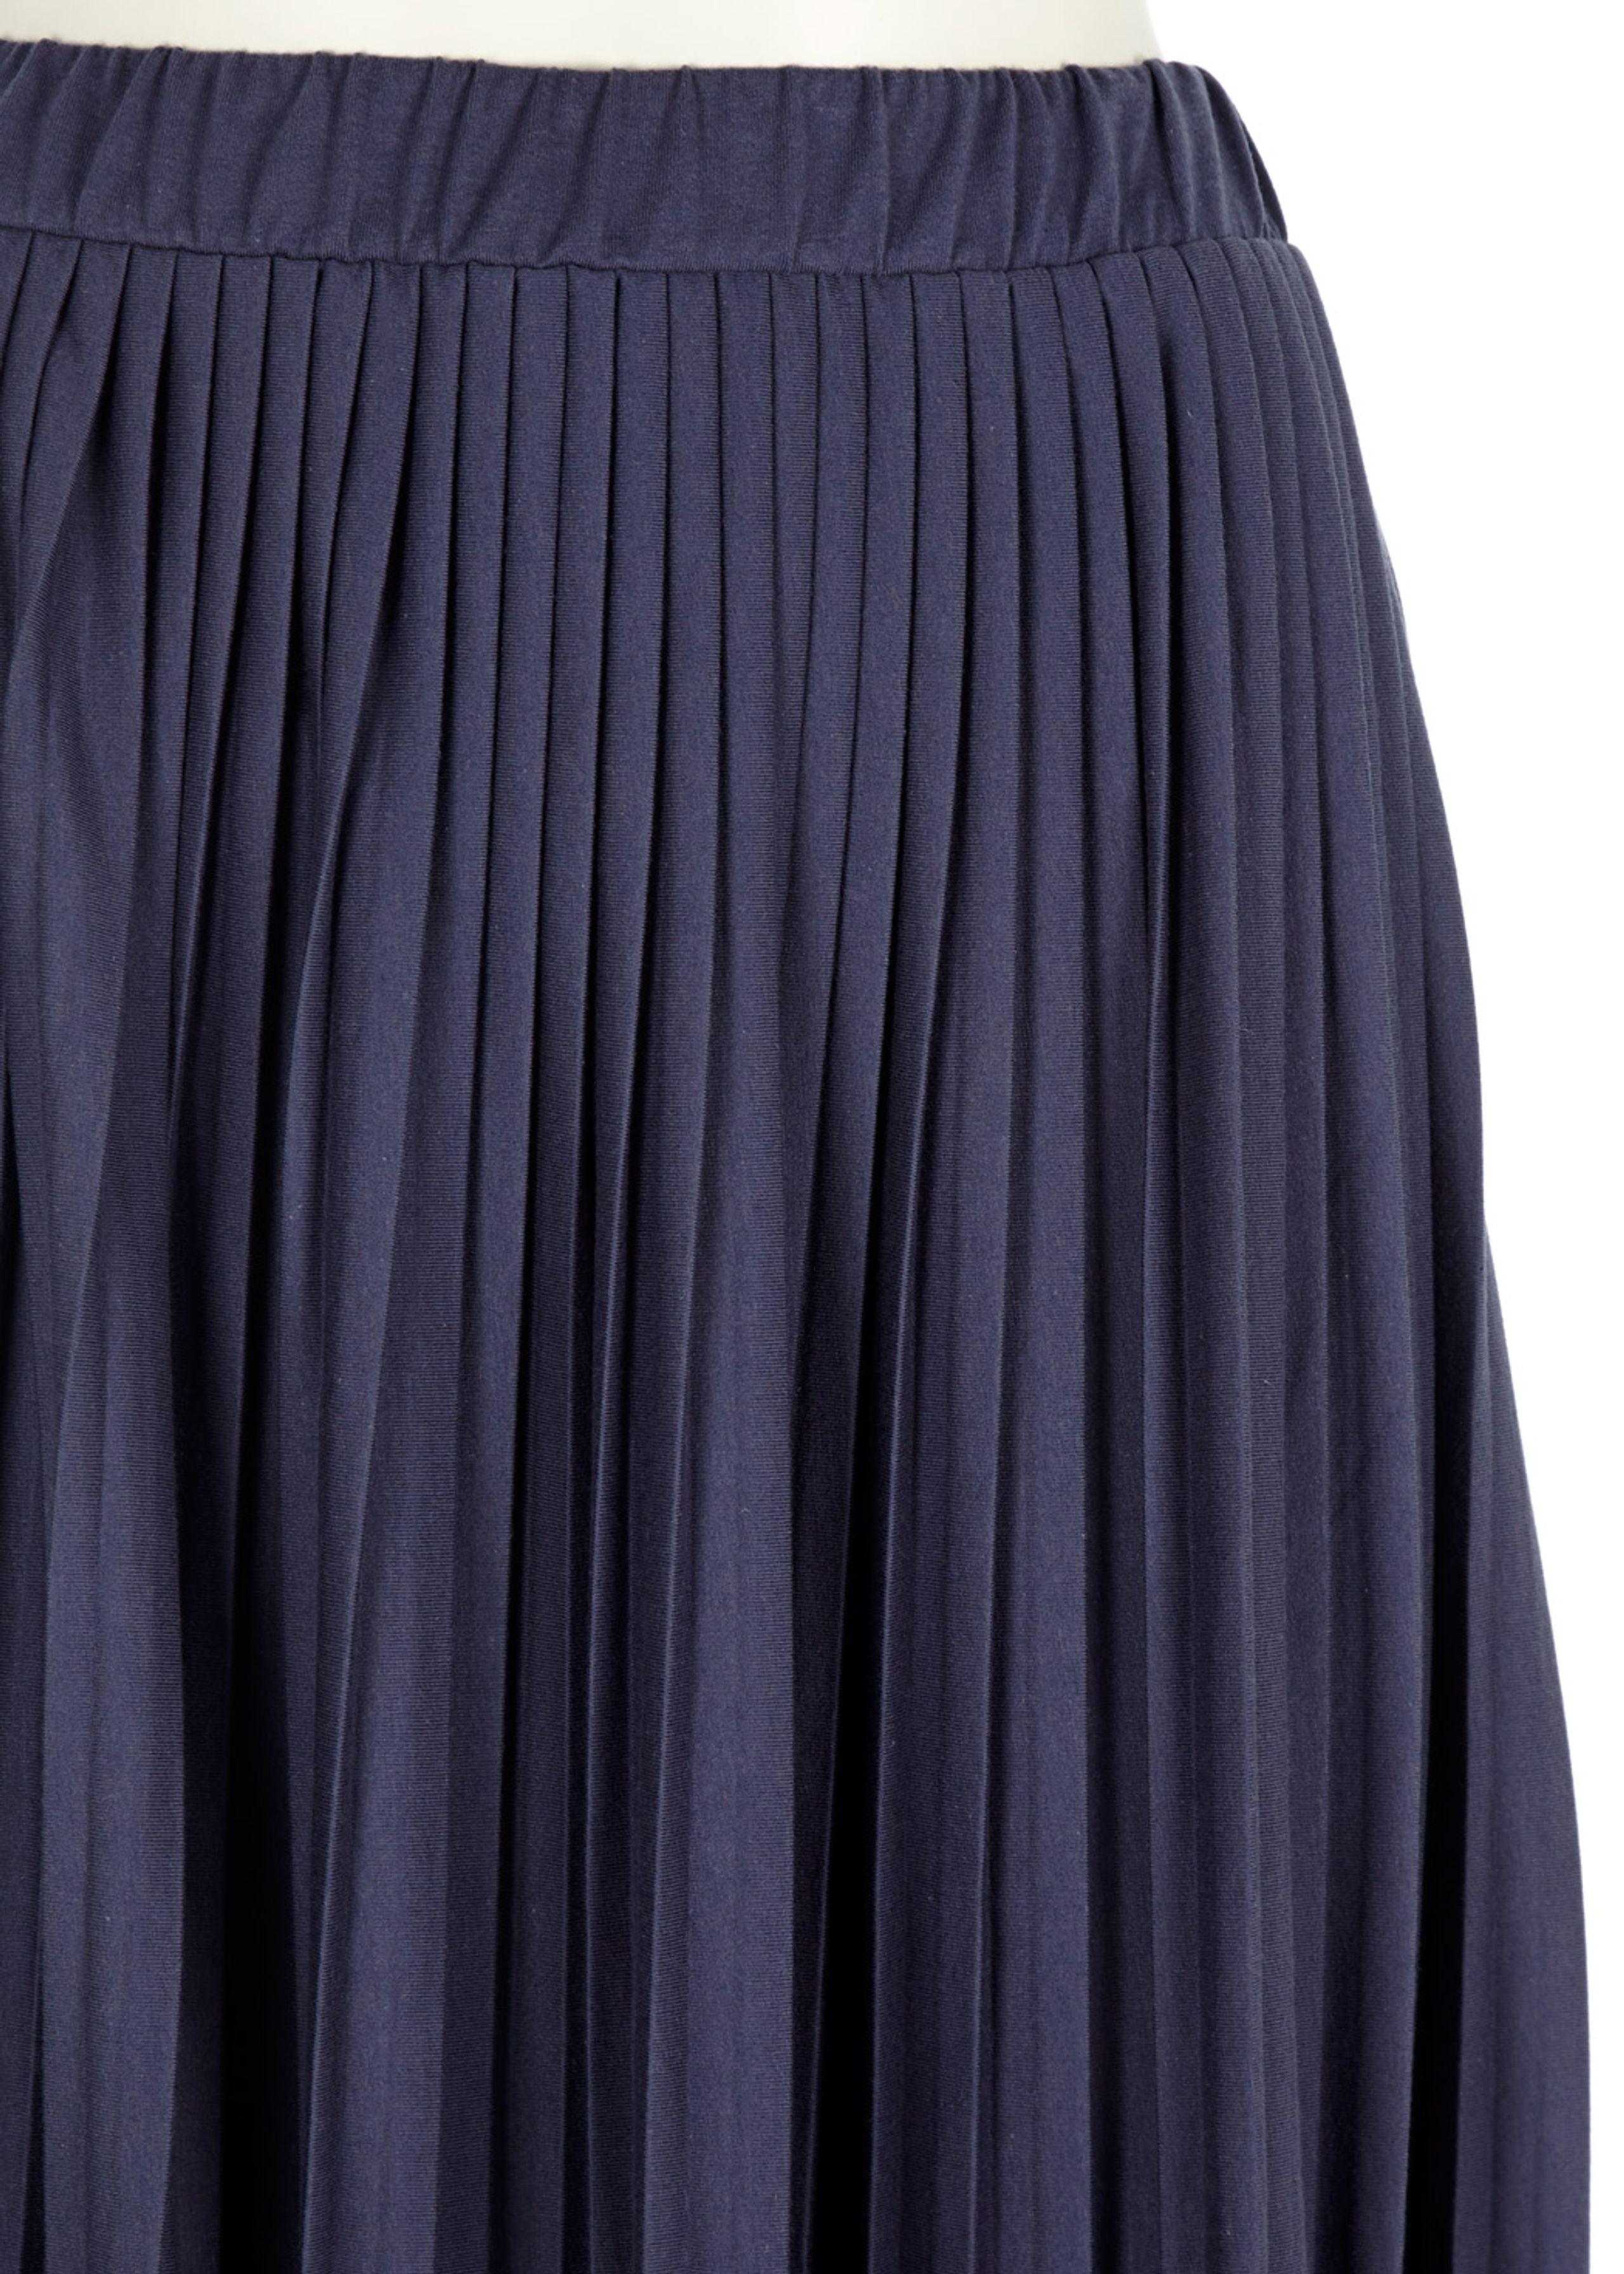 jupe plisse skirt le mont saint michel. Black Bedroom Furniture Sets. Home Design Ideas